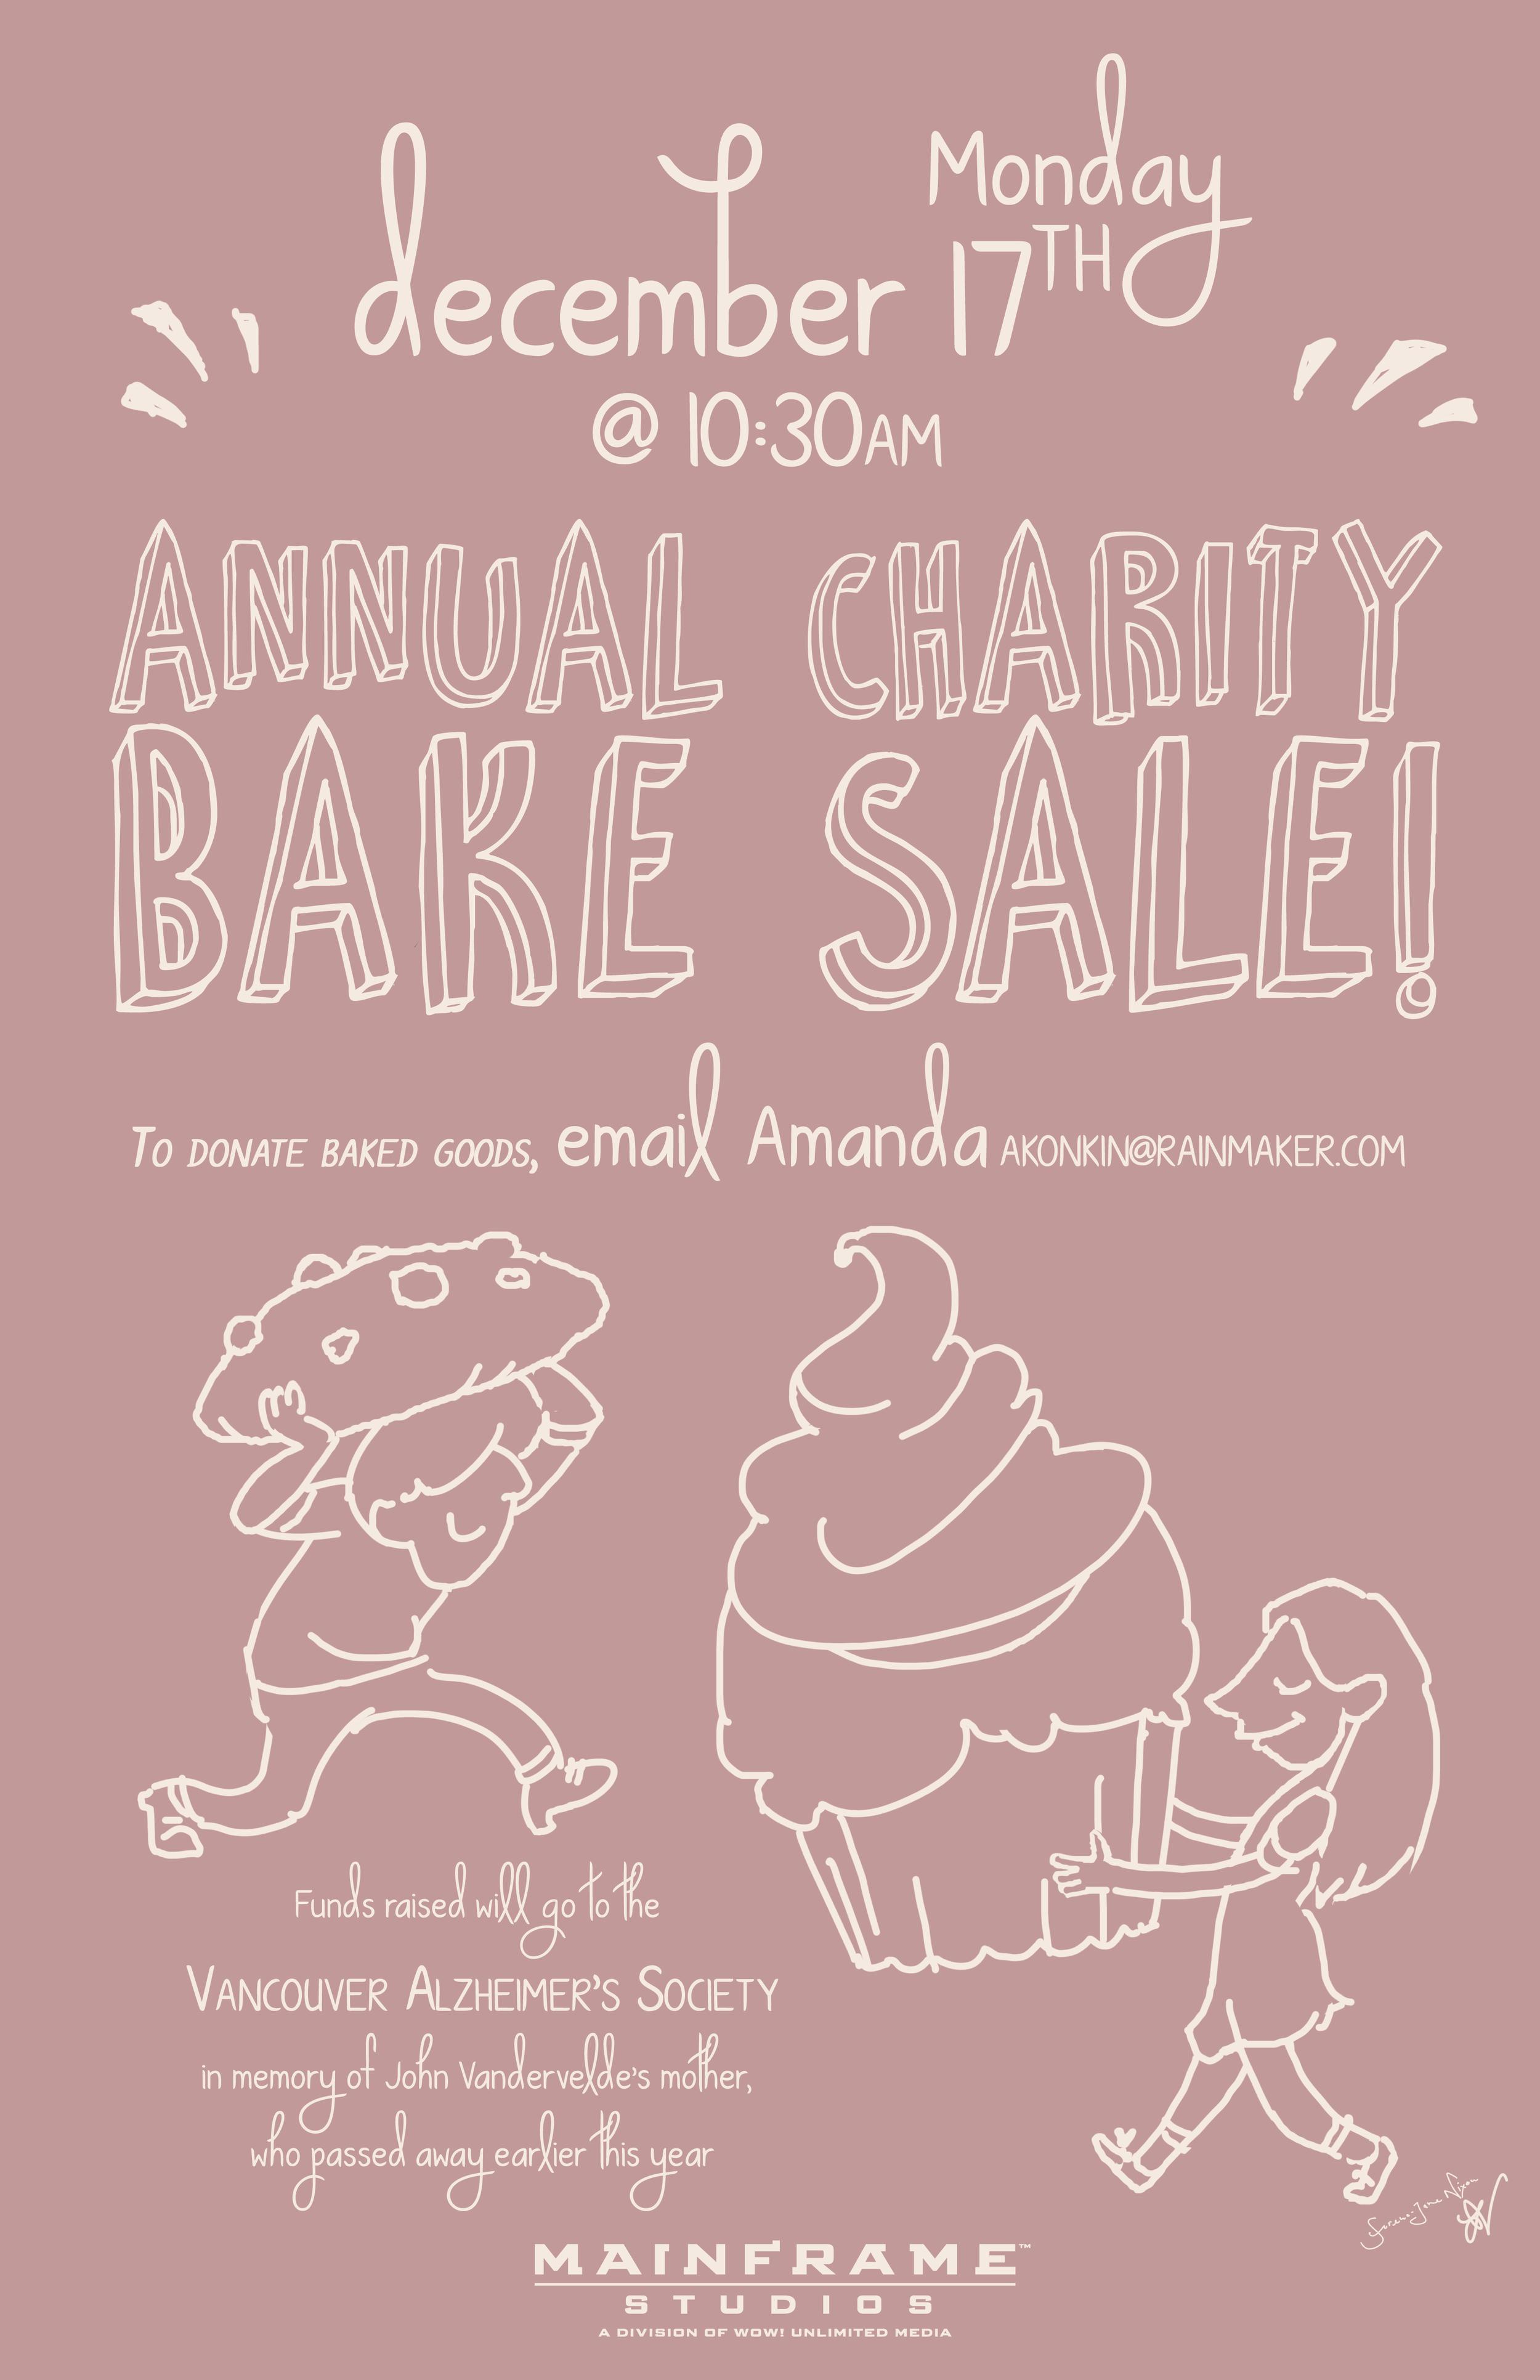 Bake sale poster_2018_web.png